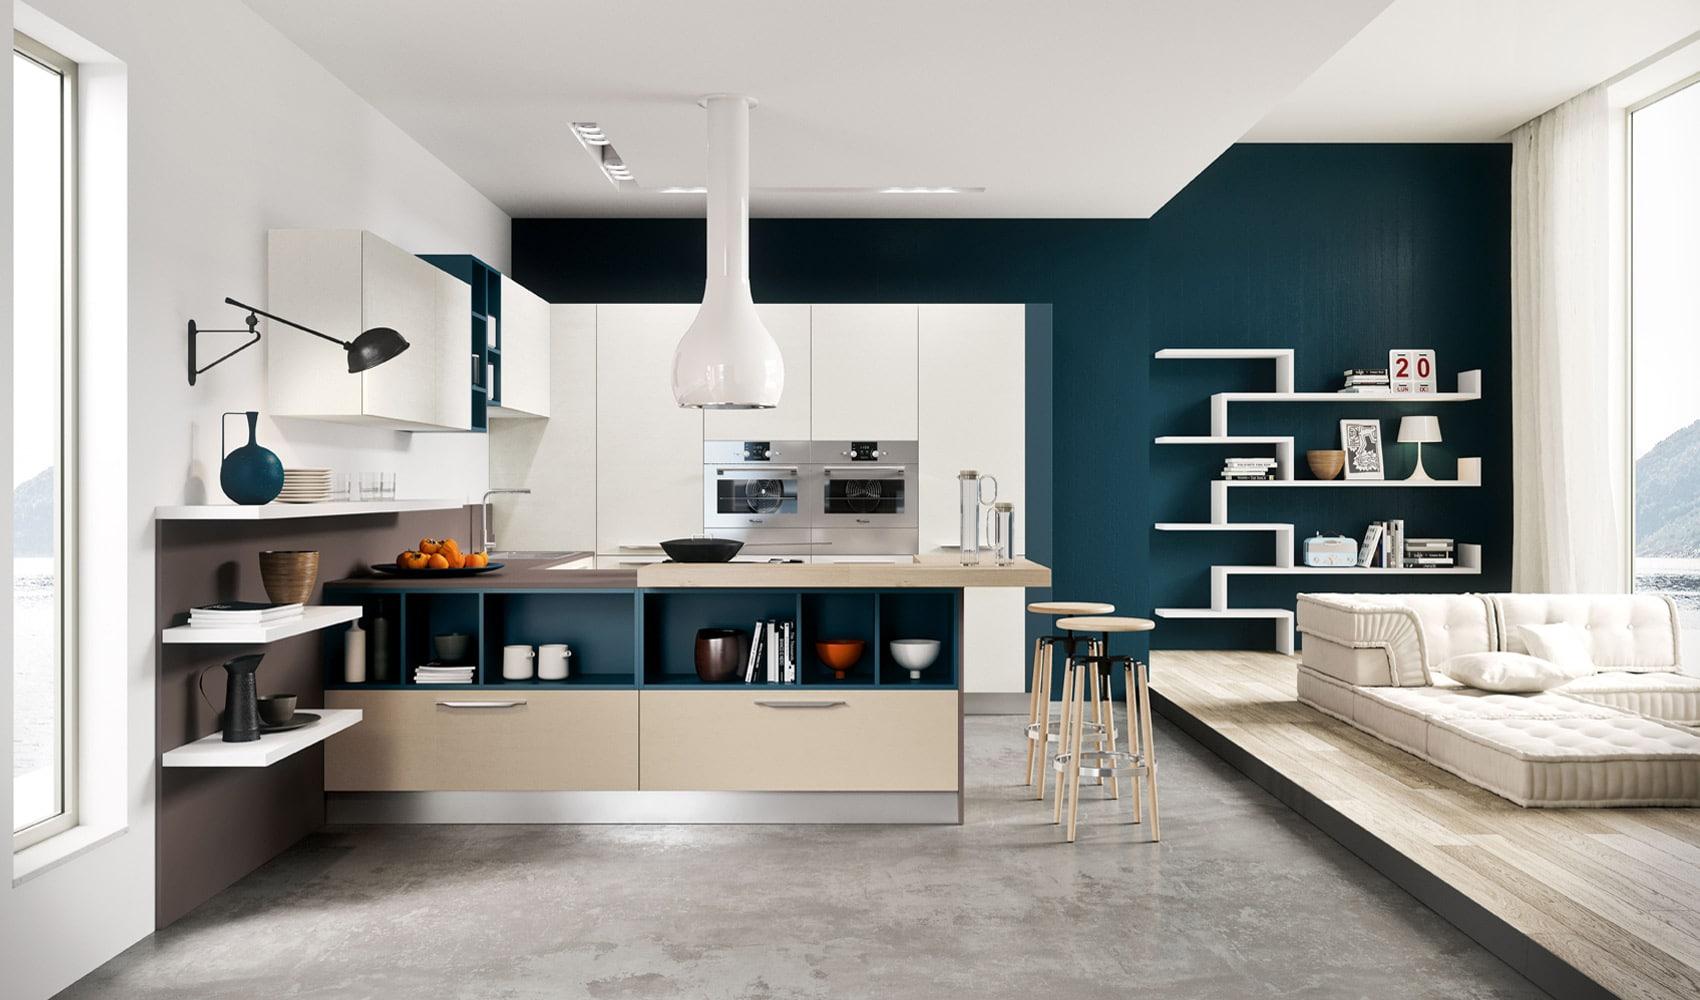 Dise o de cocinas modernas al estilo arte pop construye for Disenadores de cocinas pequenas